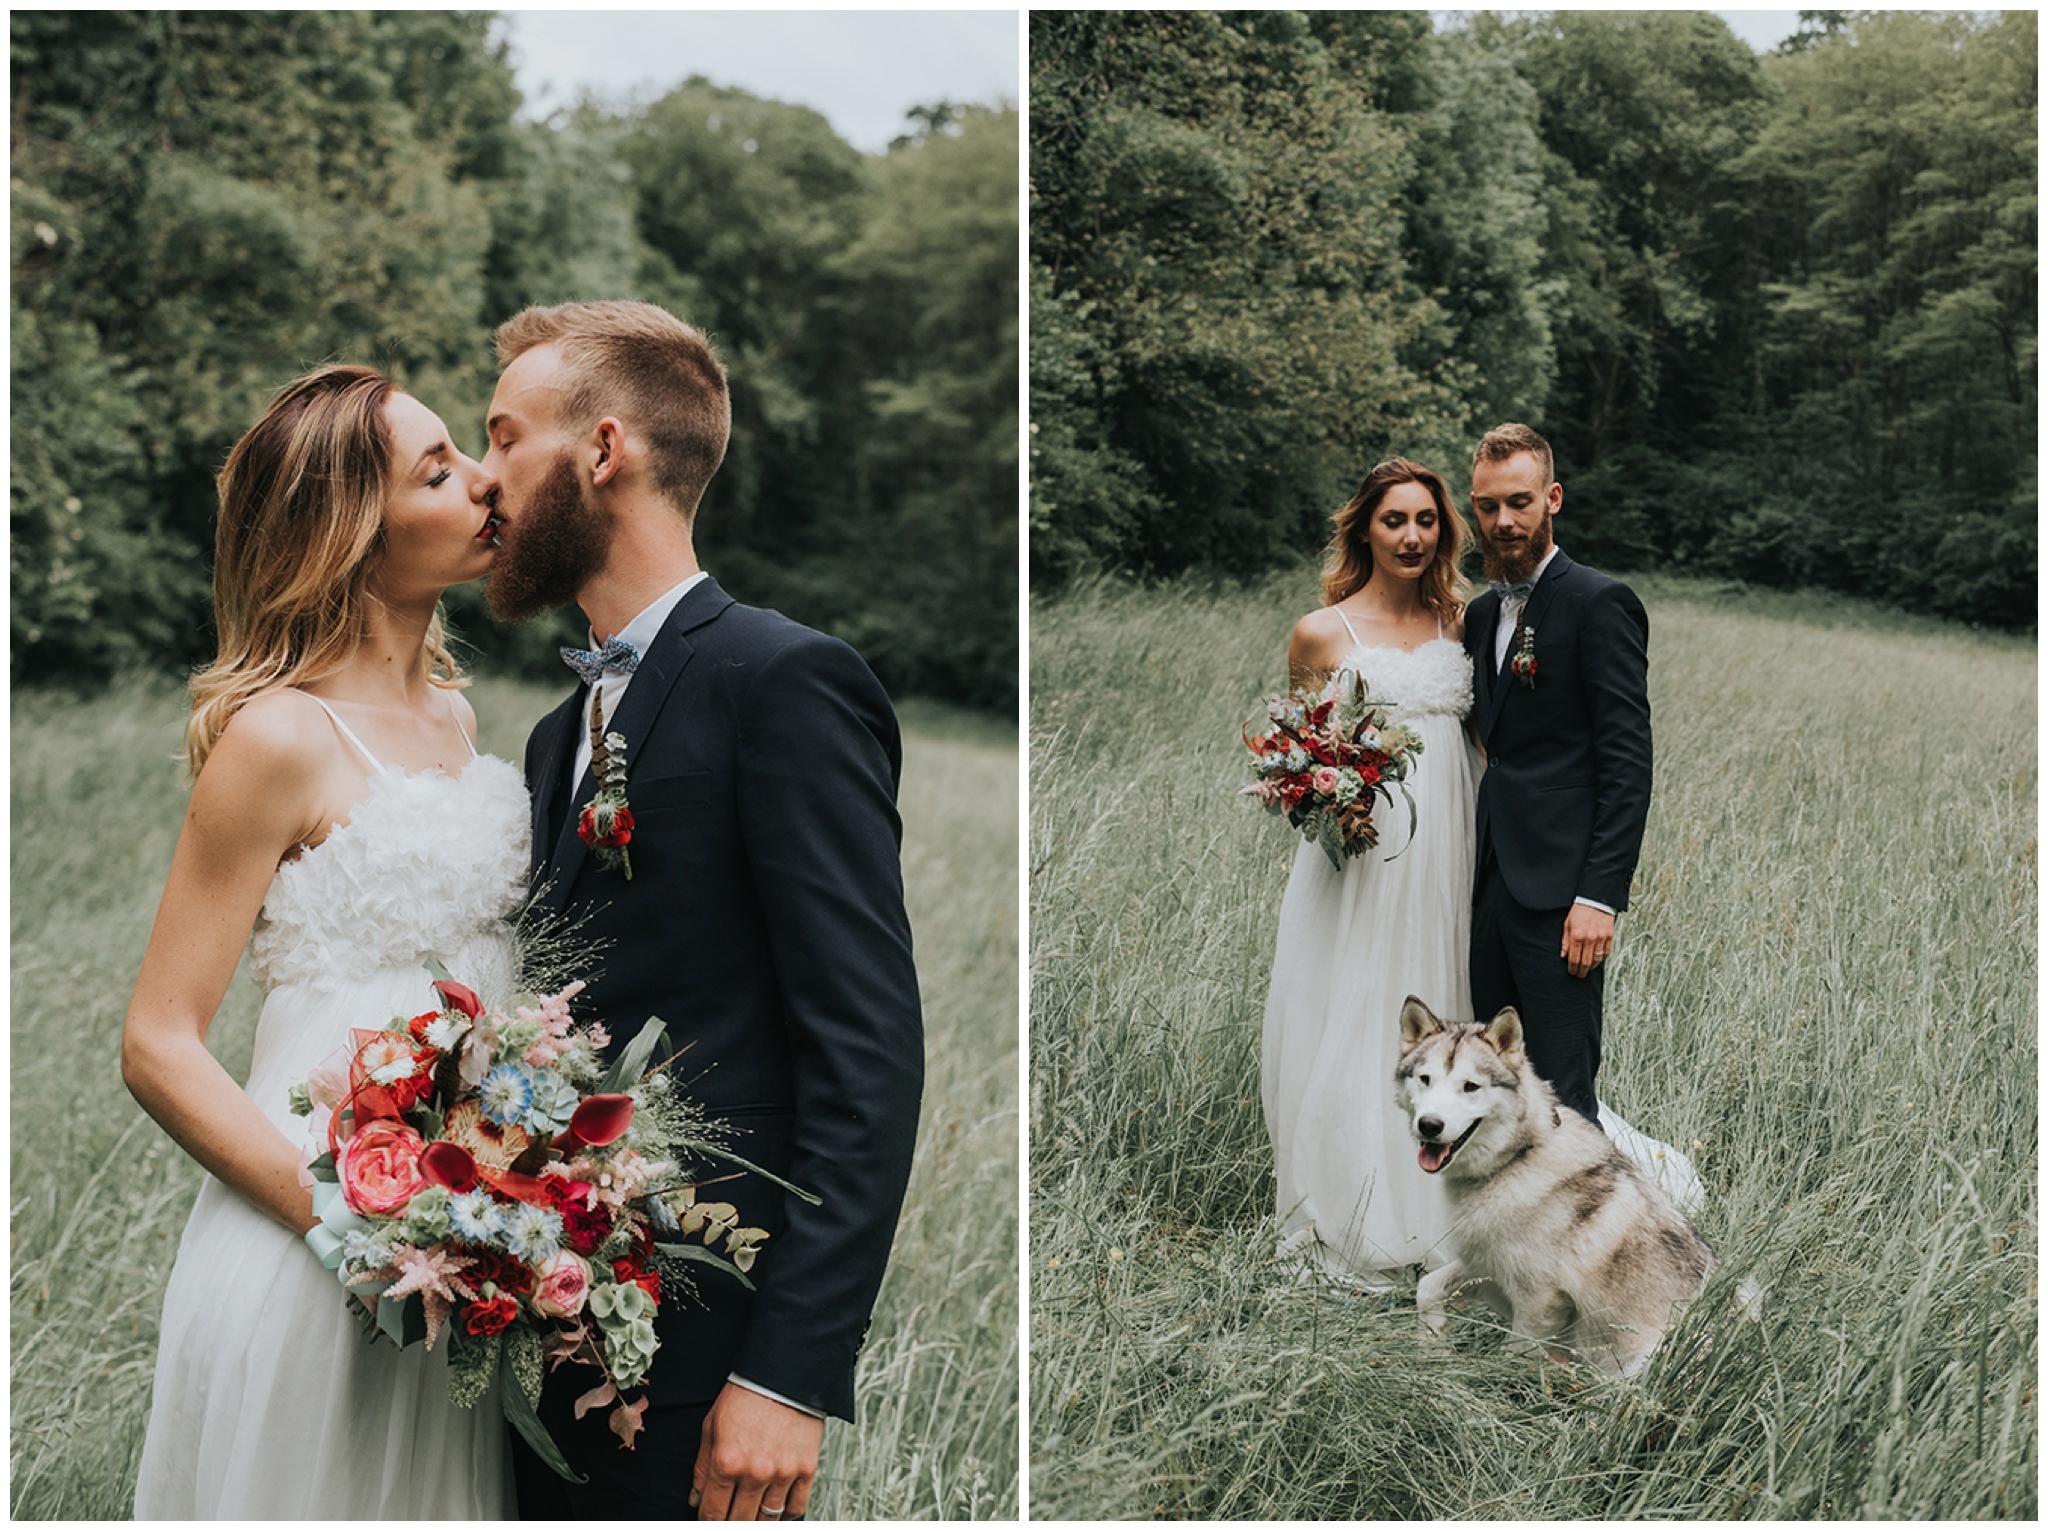 photographe-mariage-grenoble-annecy-lyon-shooting-inspiration-boheme-045